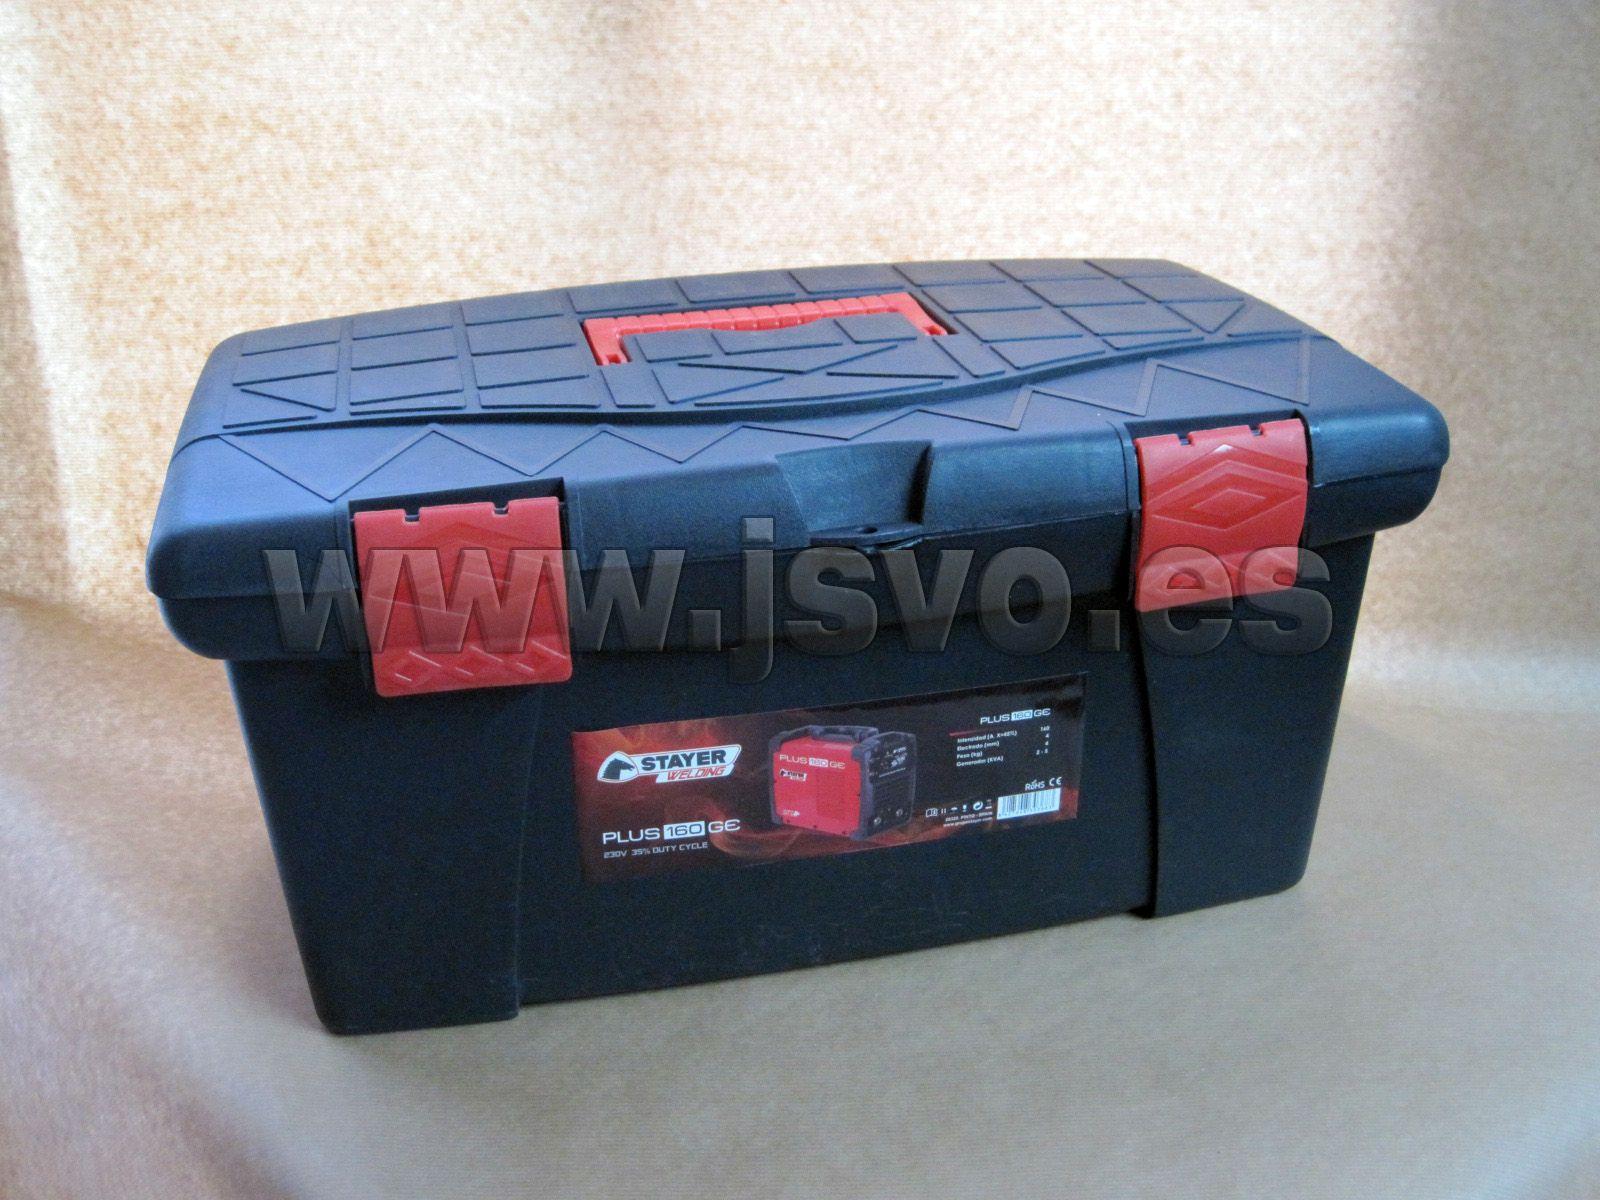 Soldadura por electrodo 40% Inverter MMA Stayer ® Professional Line Plus 160 GE KIT ref.: 1.1213 www.jsvo.es